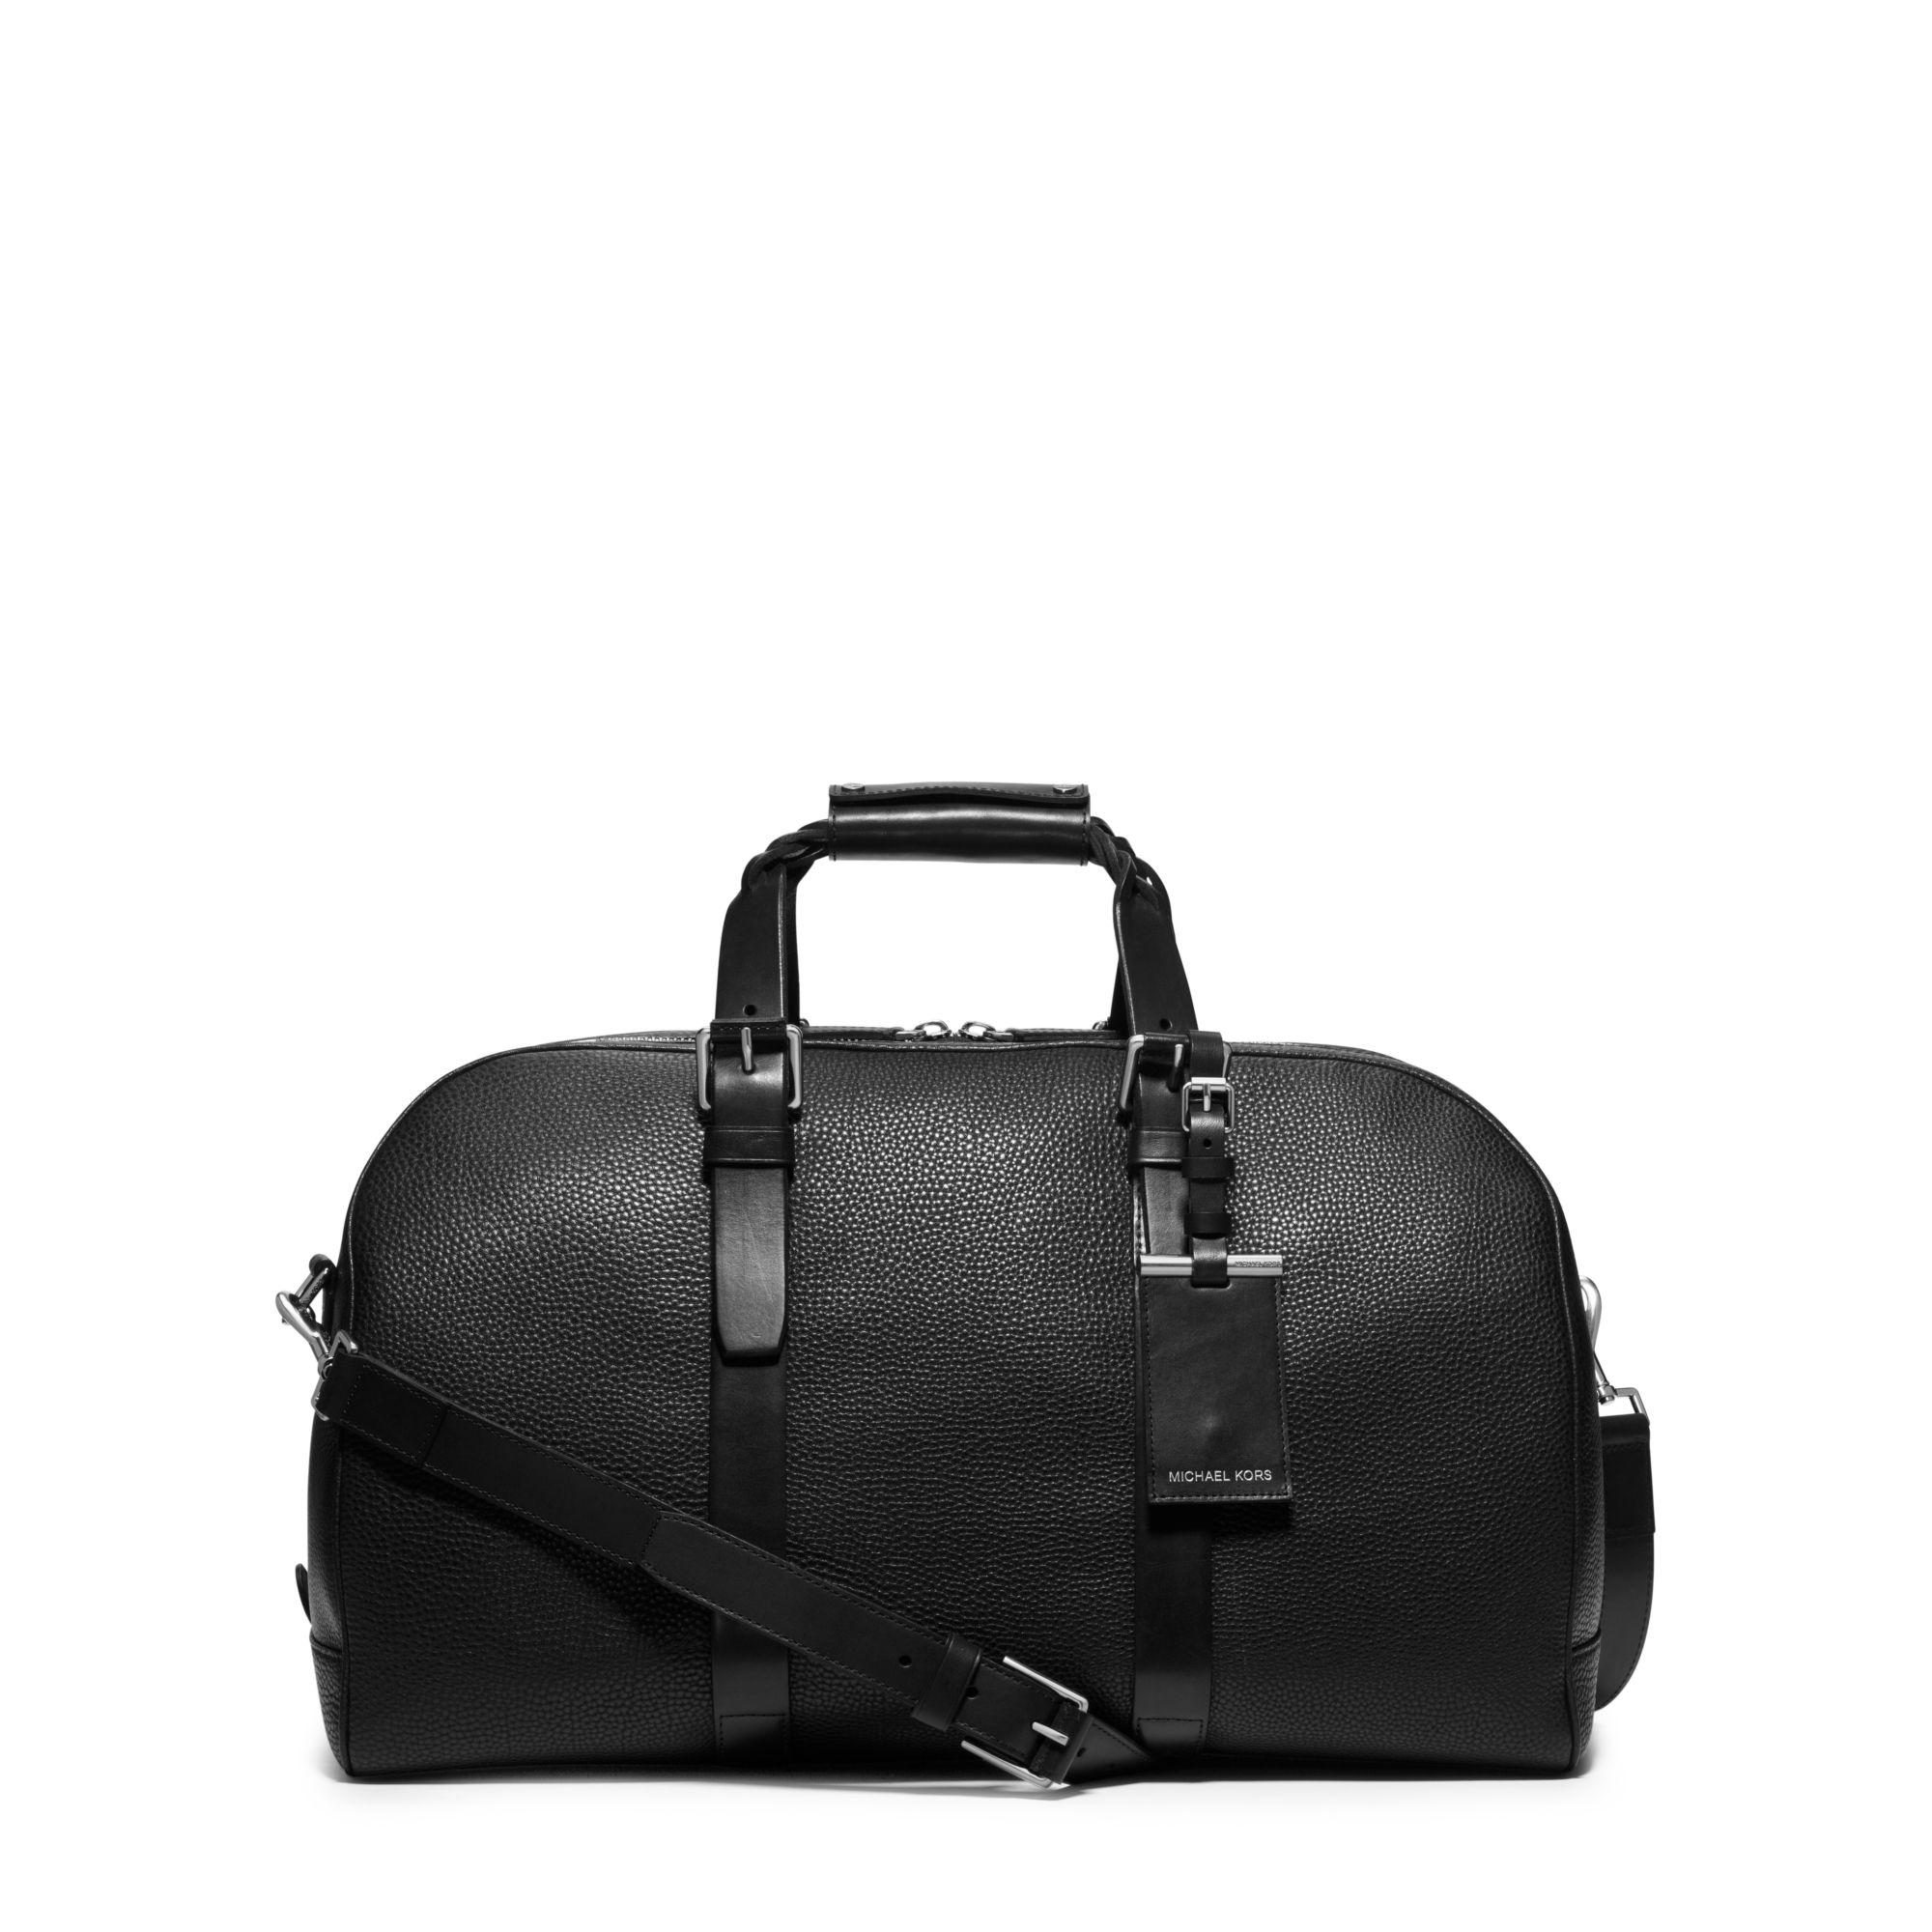 65285d063ccf Lyst - Michael Kors Bennett Large Pebbled-leather Duffel in Black ...